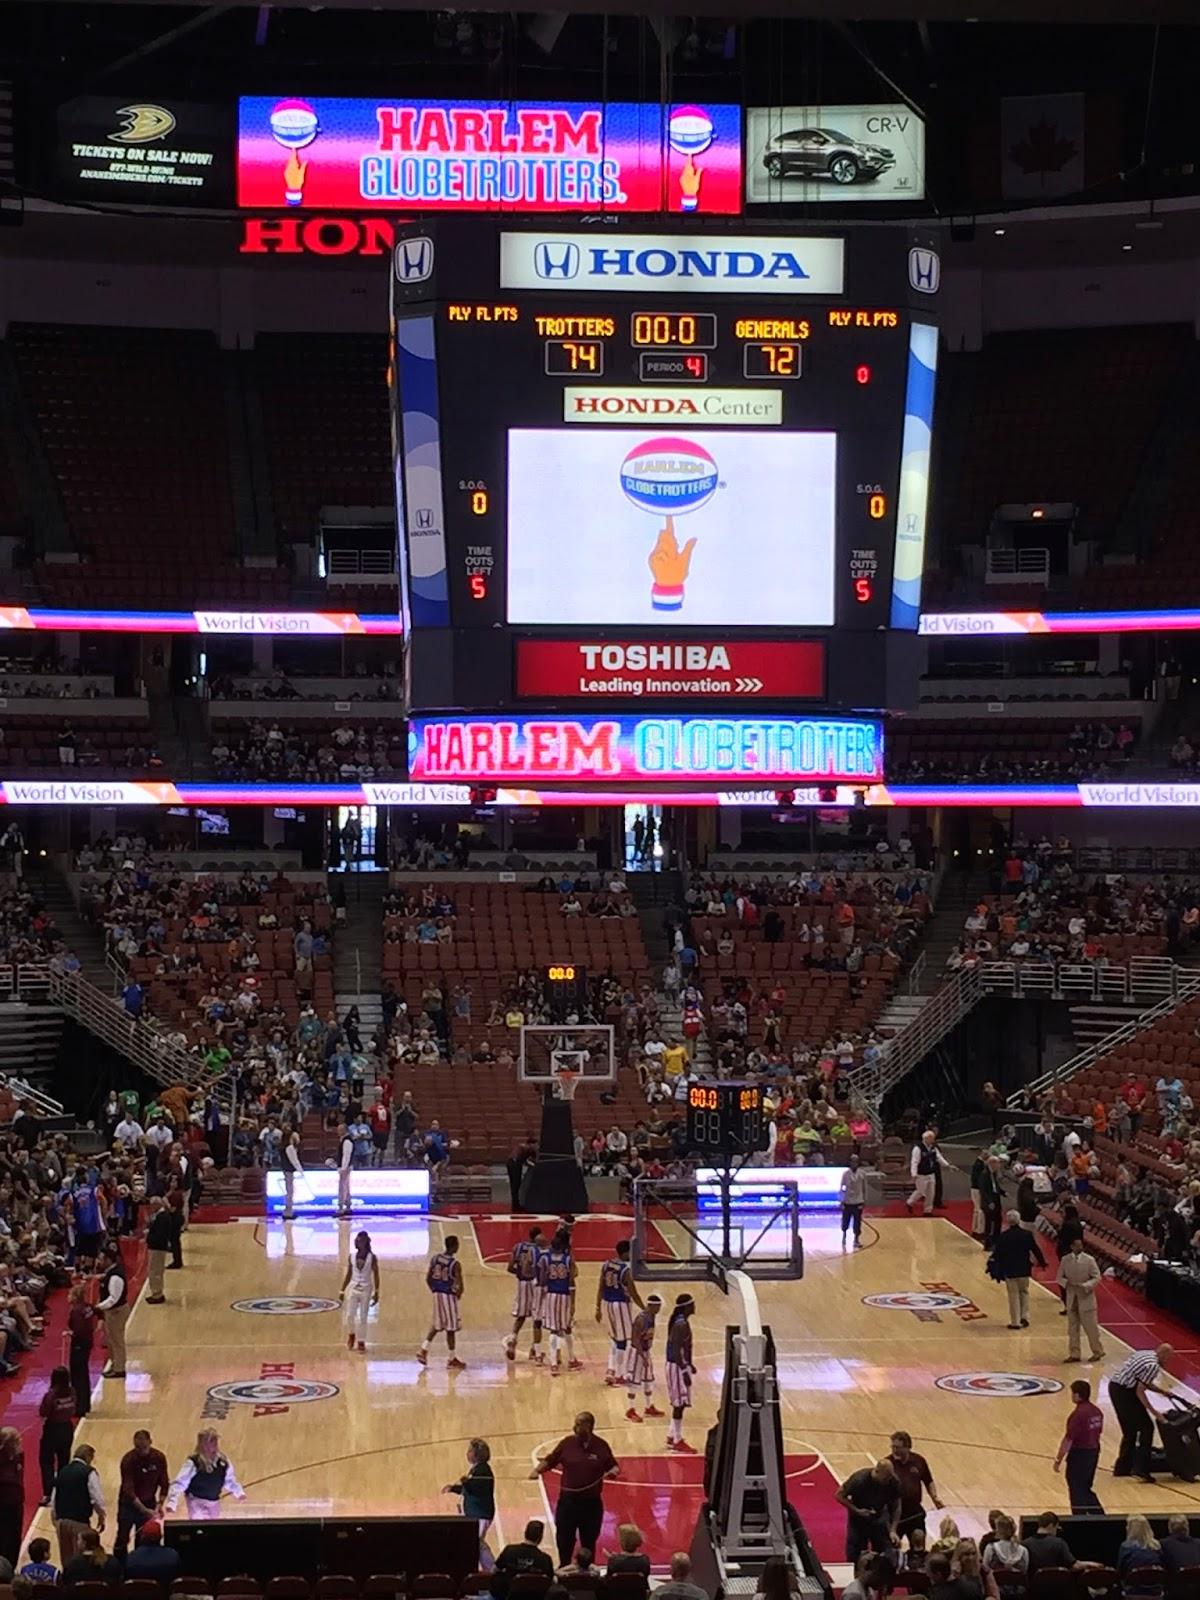 Honda Center Globetrotters